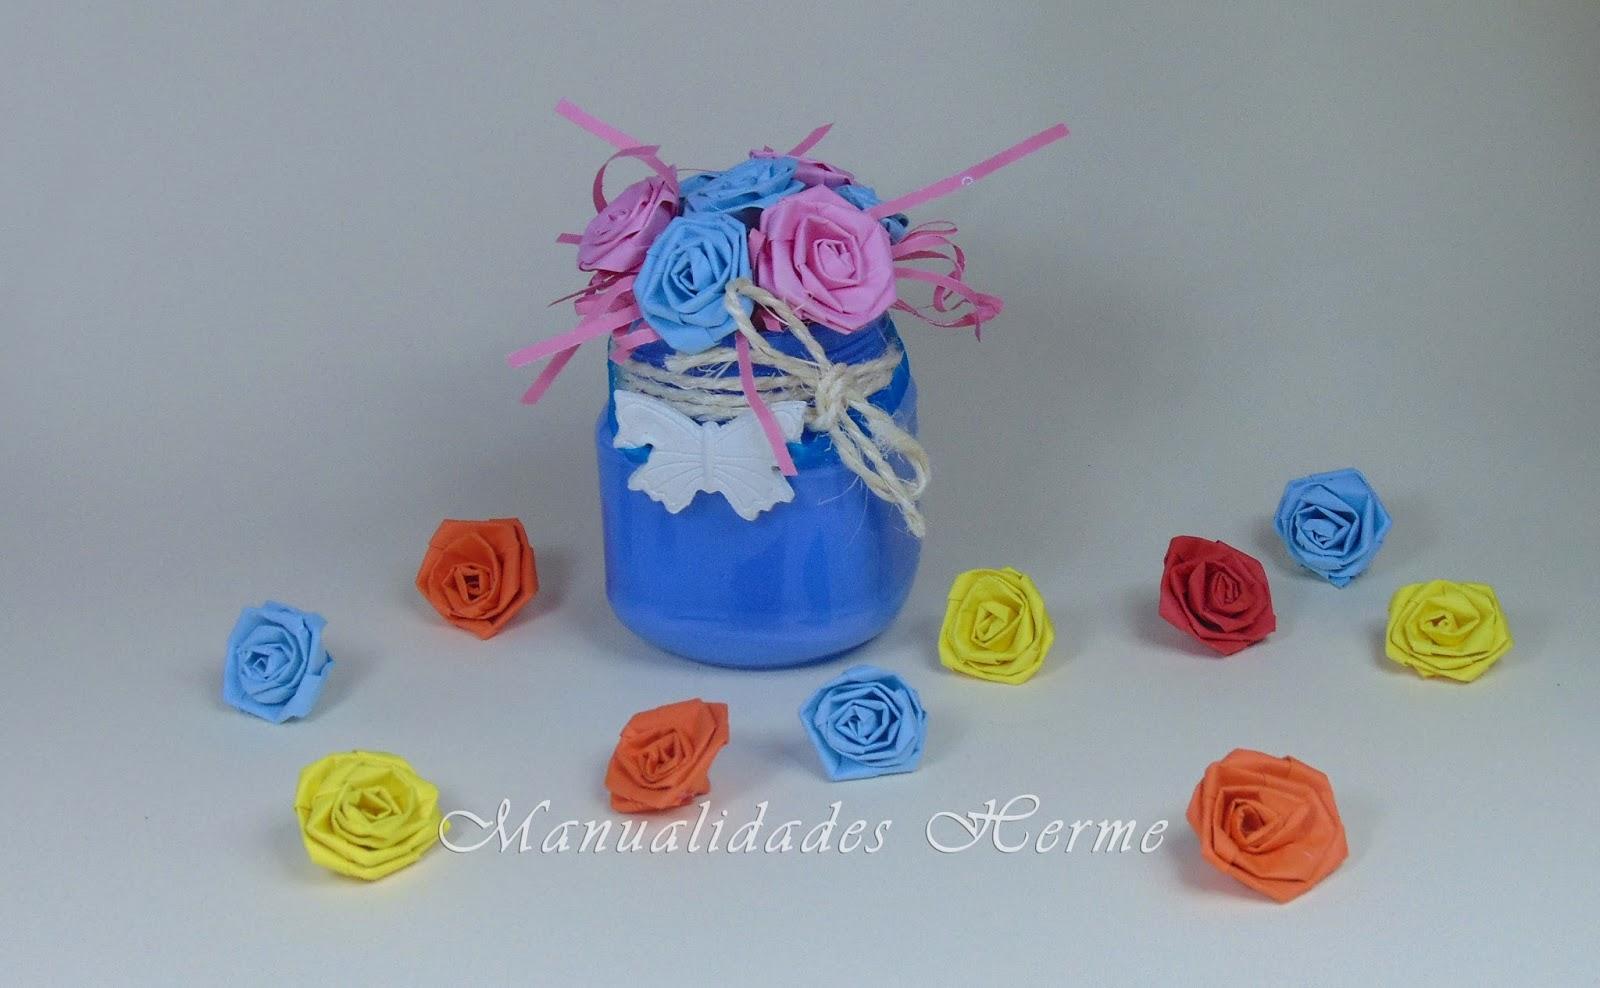 Manualidades herme hacer flores de papel - Papel partitura para manualidades ...